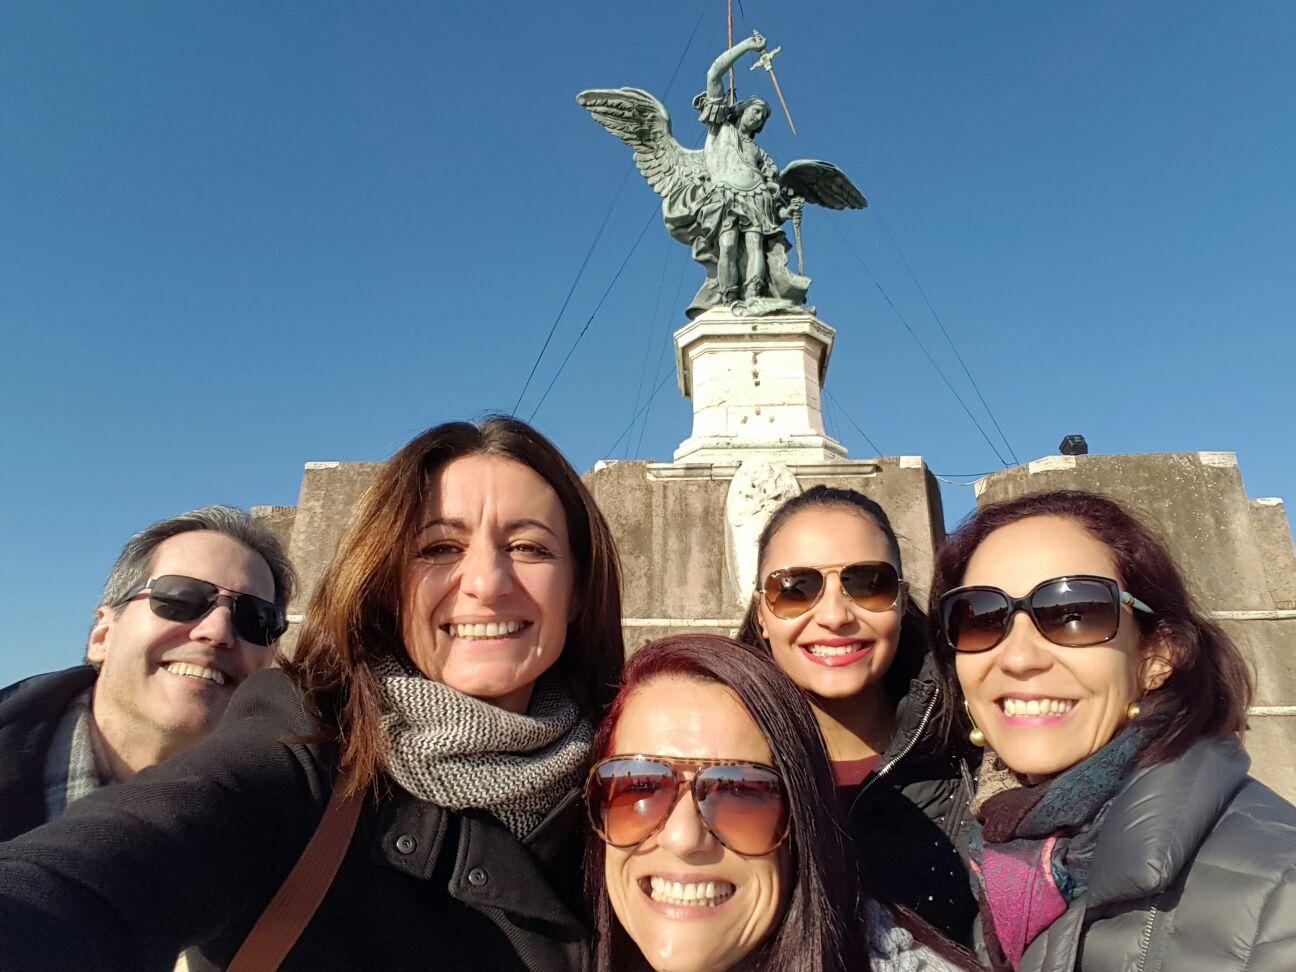 CastelSantangelo Malhadas - Passeios Roma, centro-histórico museal!